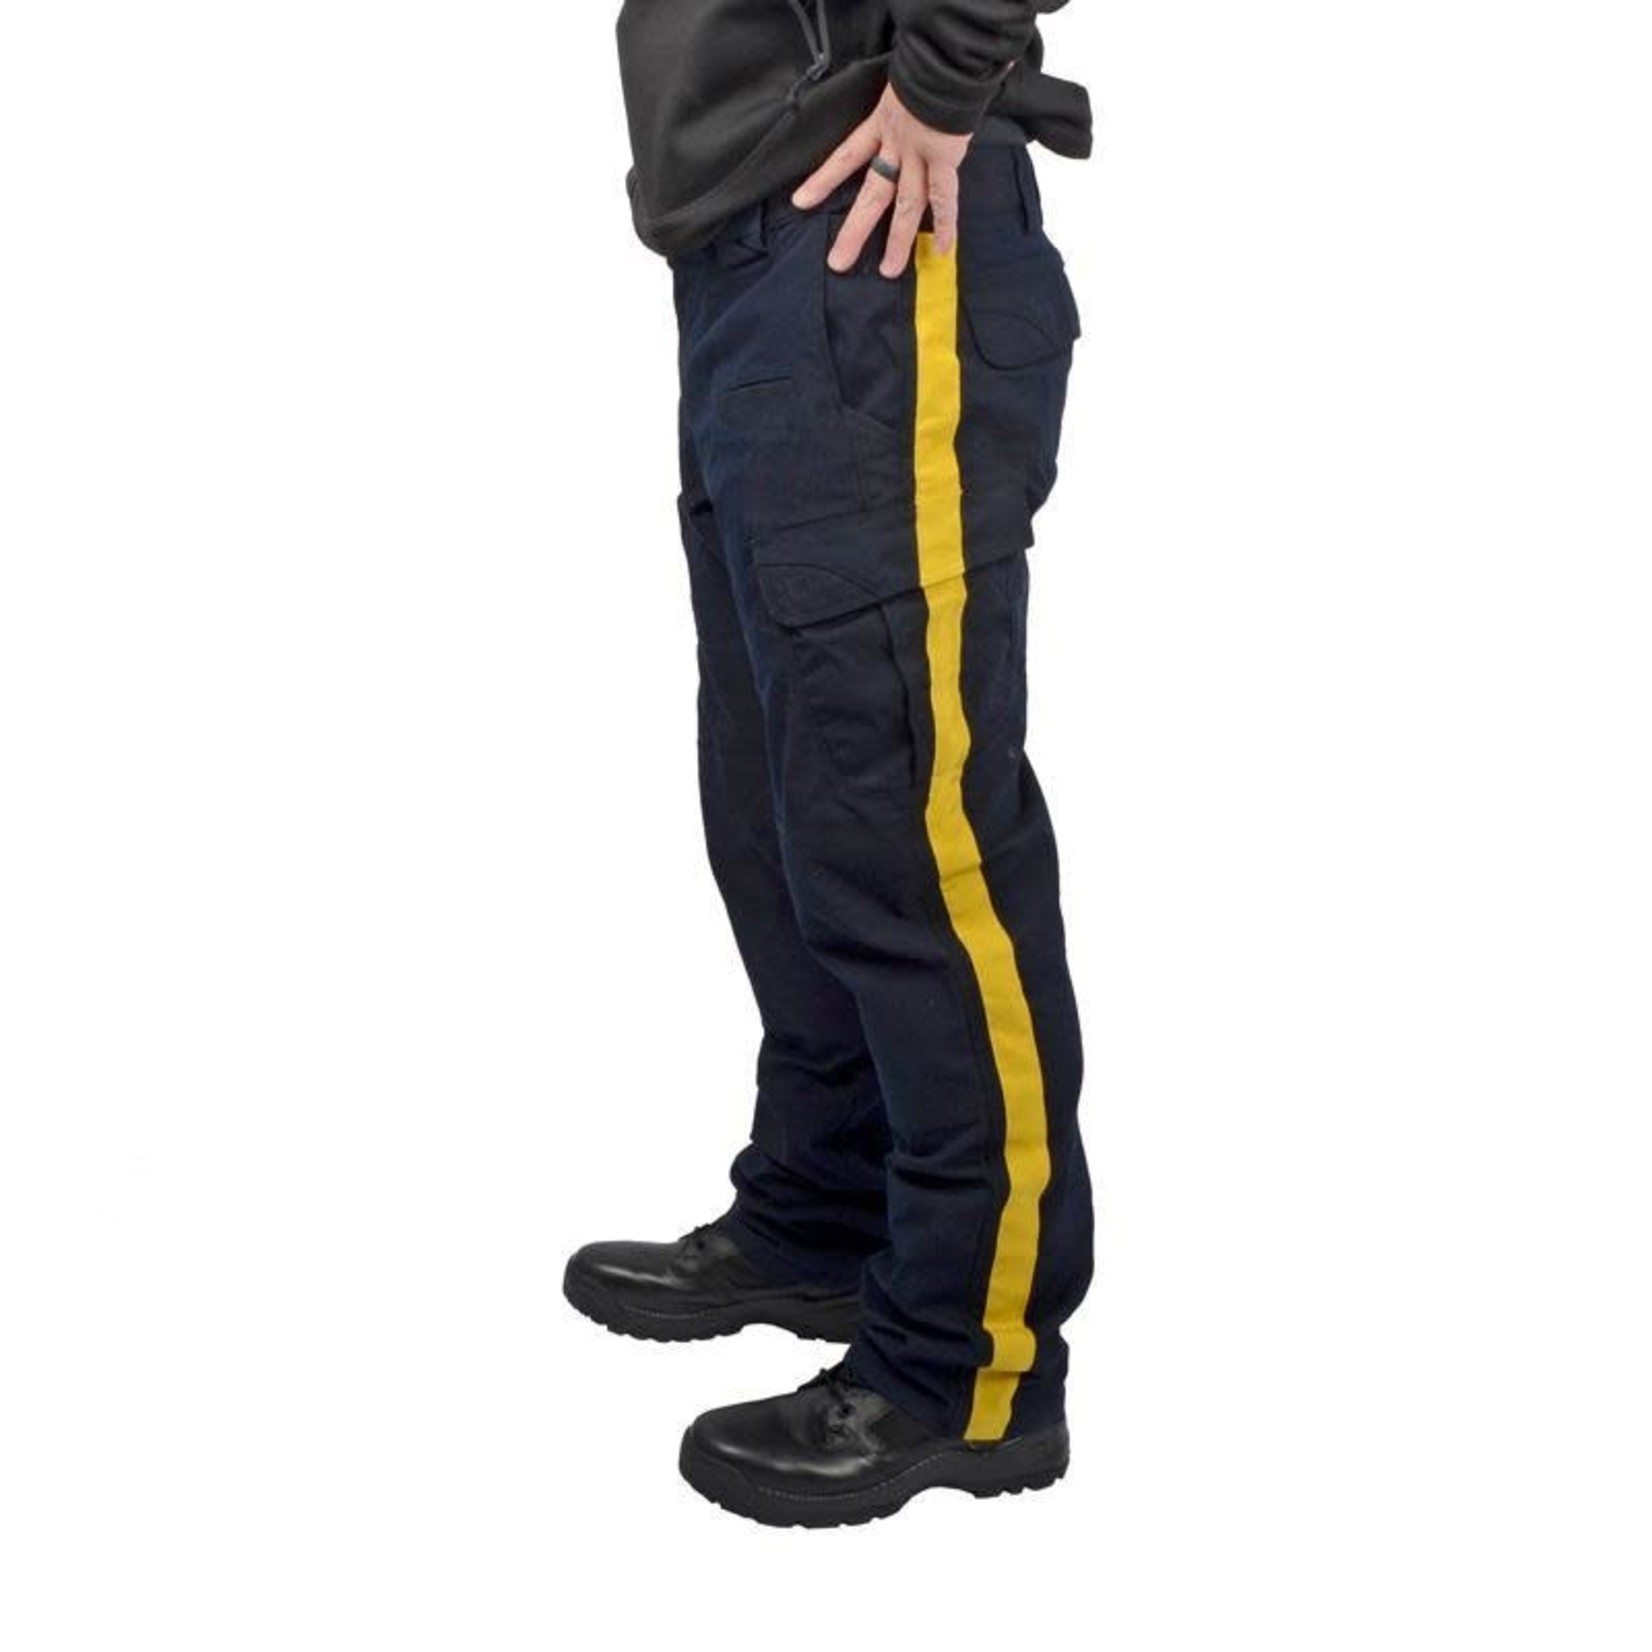 5.11 Tactical 5.11 Women's Stryke Pants W/ Yellow Stripes